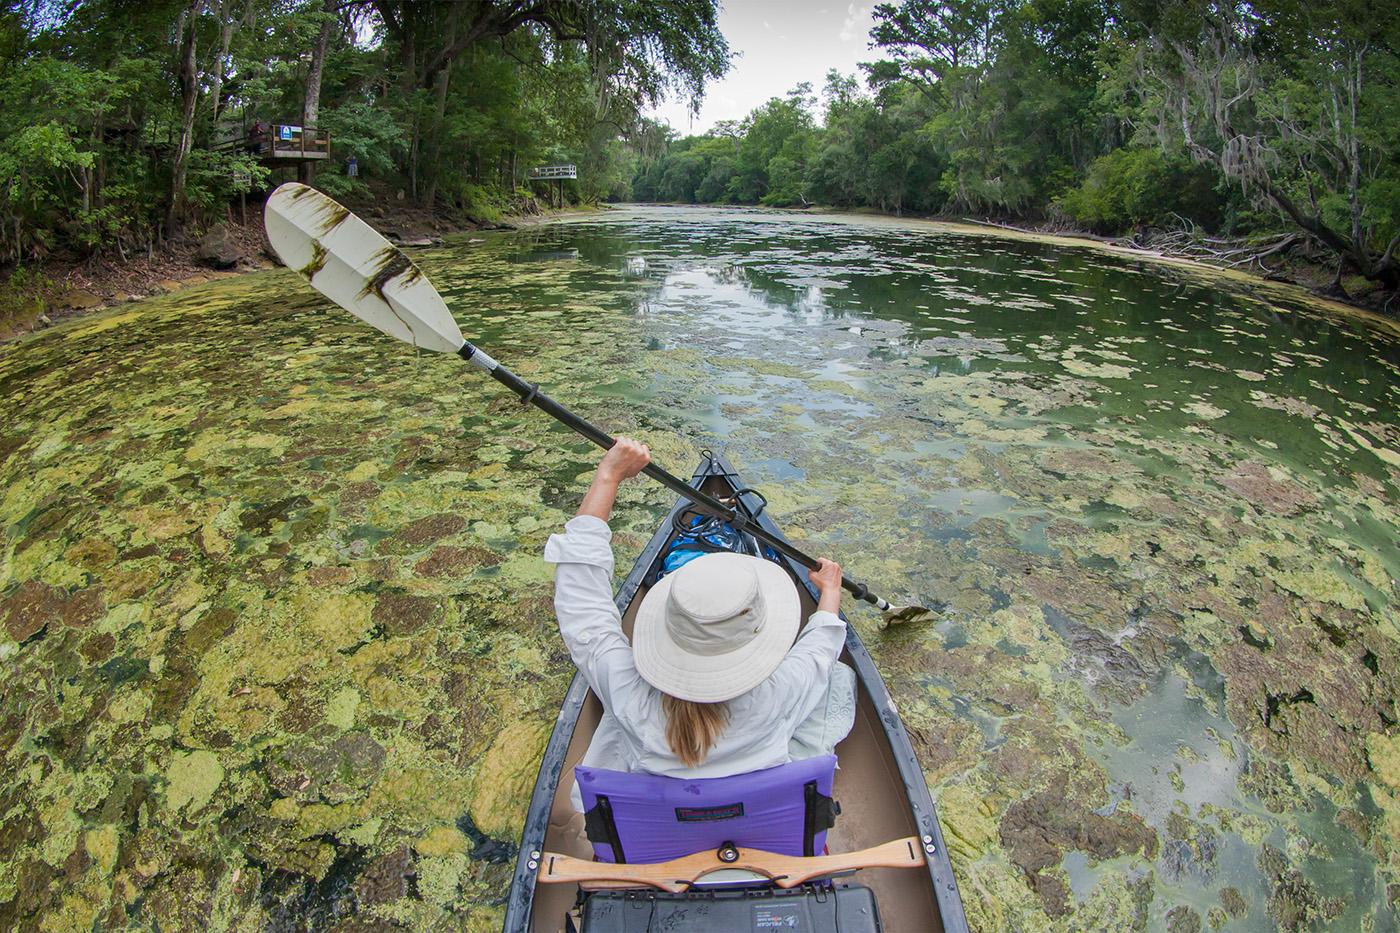 Lesley Gamble paddles through dense mats of algae on the Santa Fe River in 2012. (photo courtesy of John Moran)